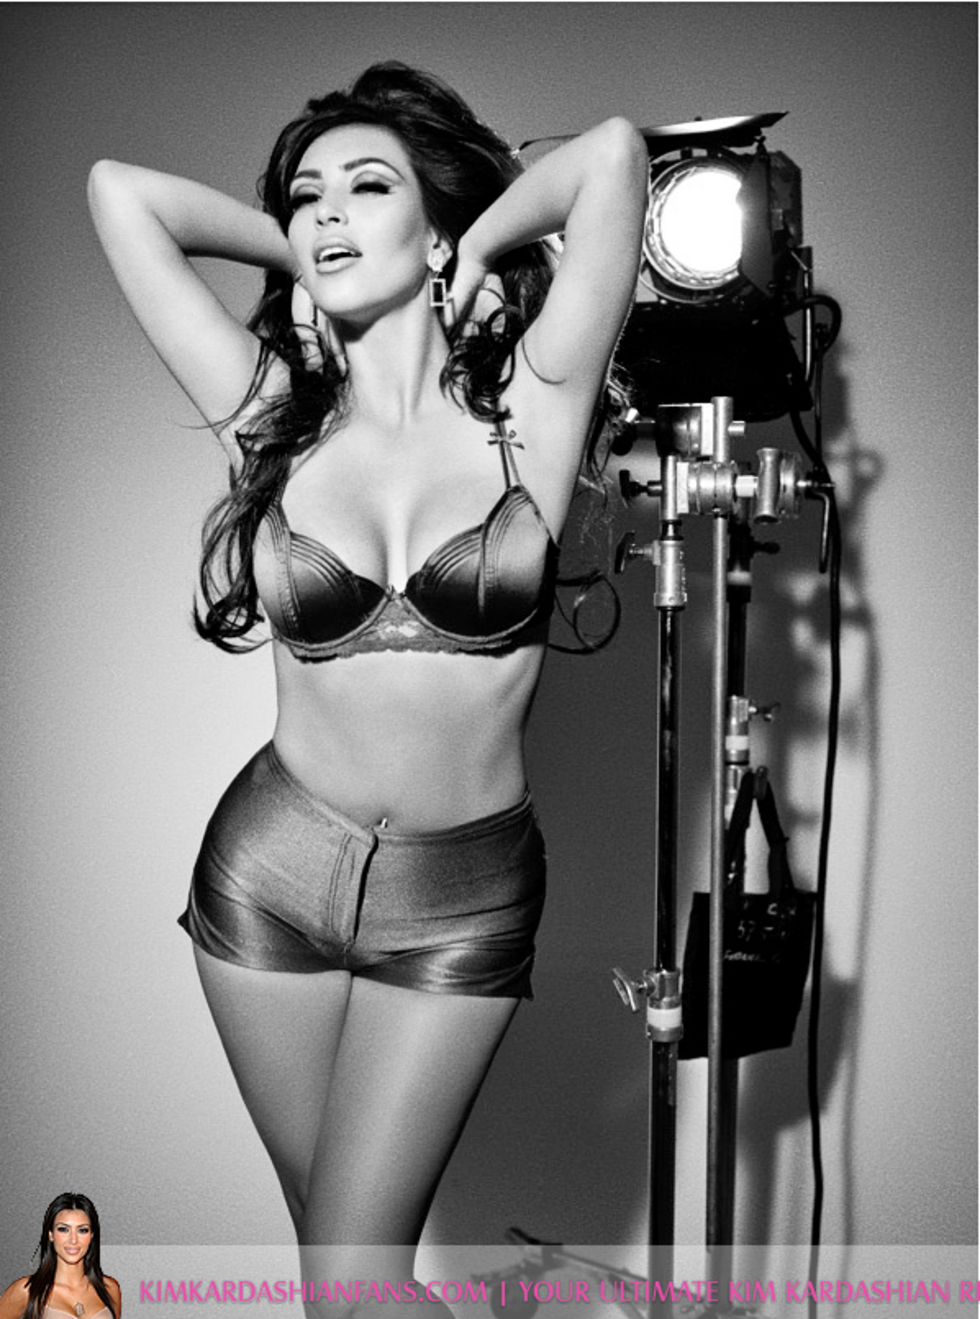 Catherine Zeta Jones nude. 2018-2019 celebrityes photos leaks! foto